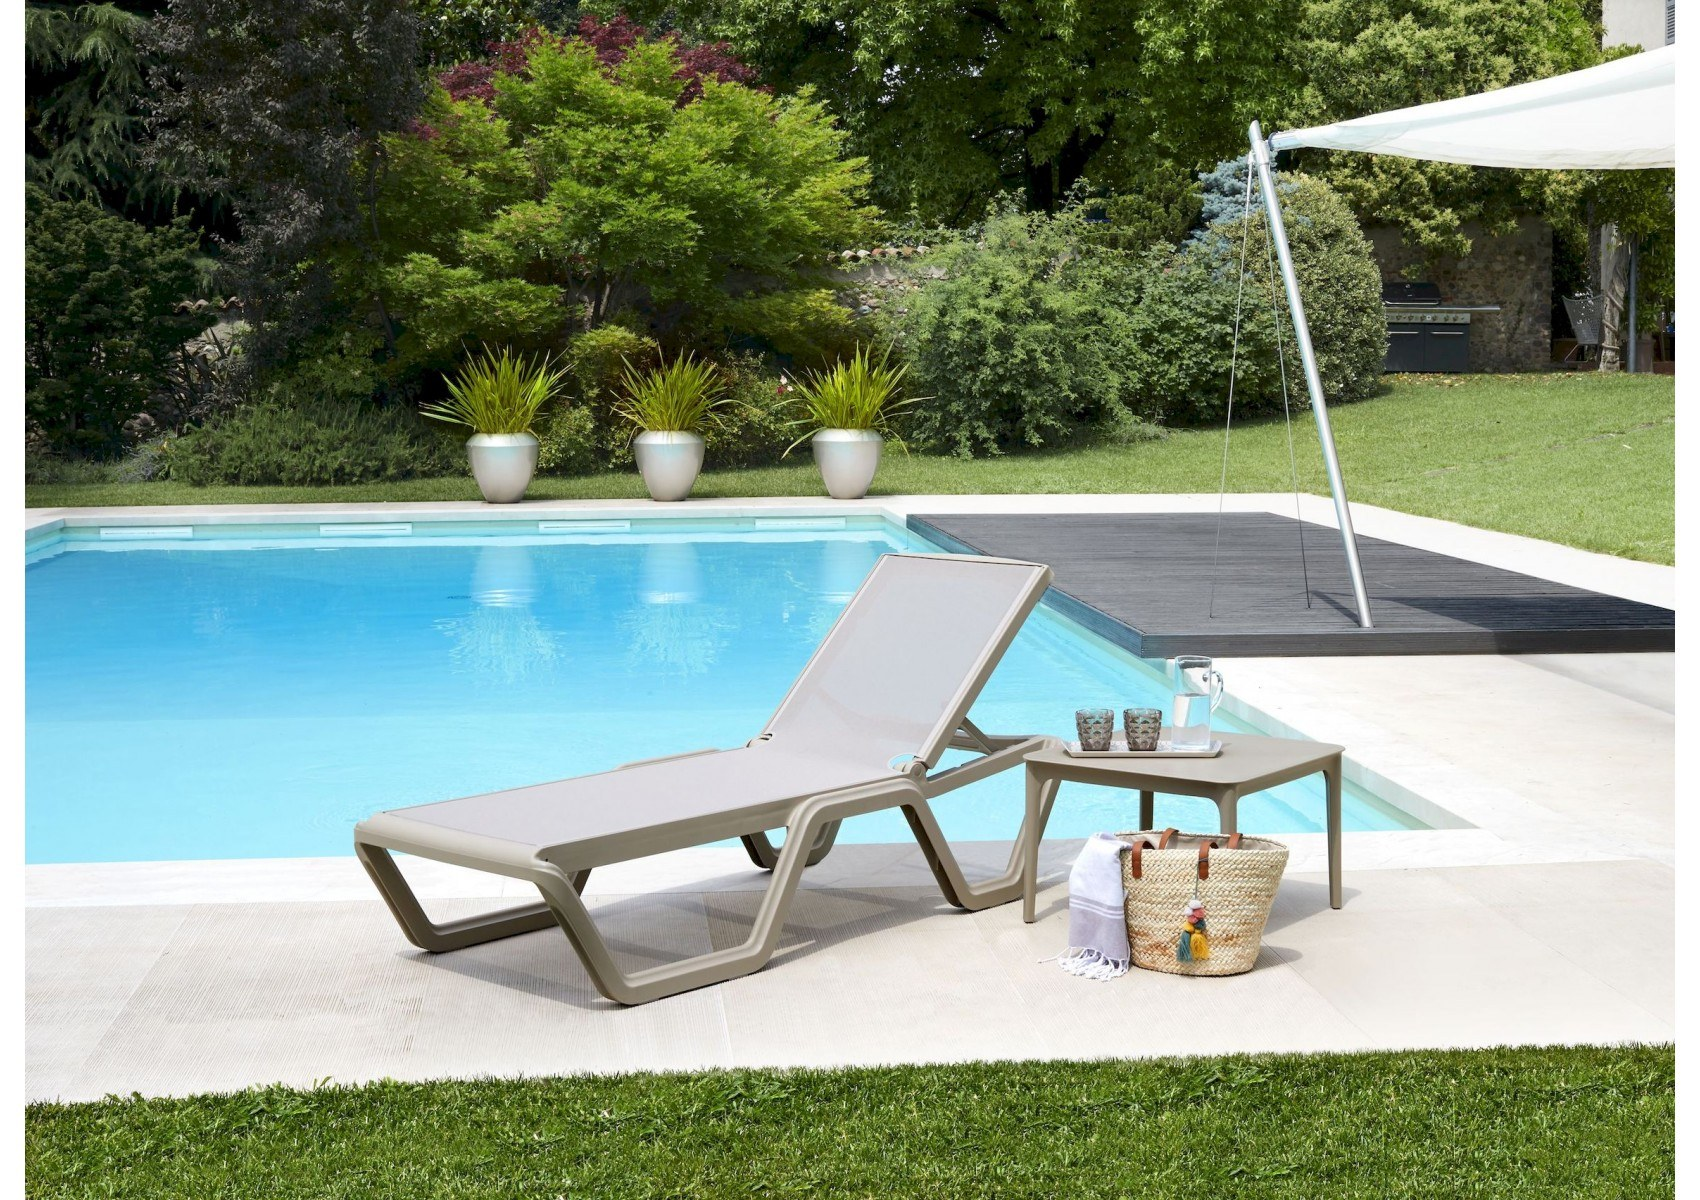 bain de soleil design roulettes vela taupe par scab design. Black Bedroom Furniture Sets. Home Design Ideas